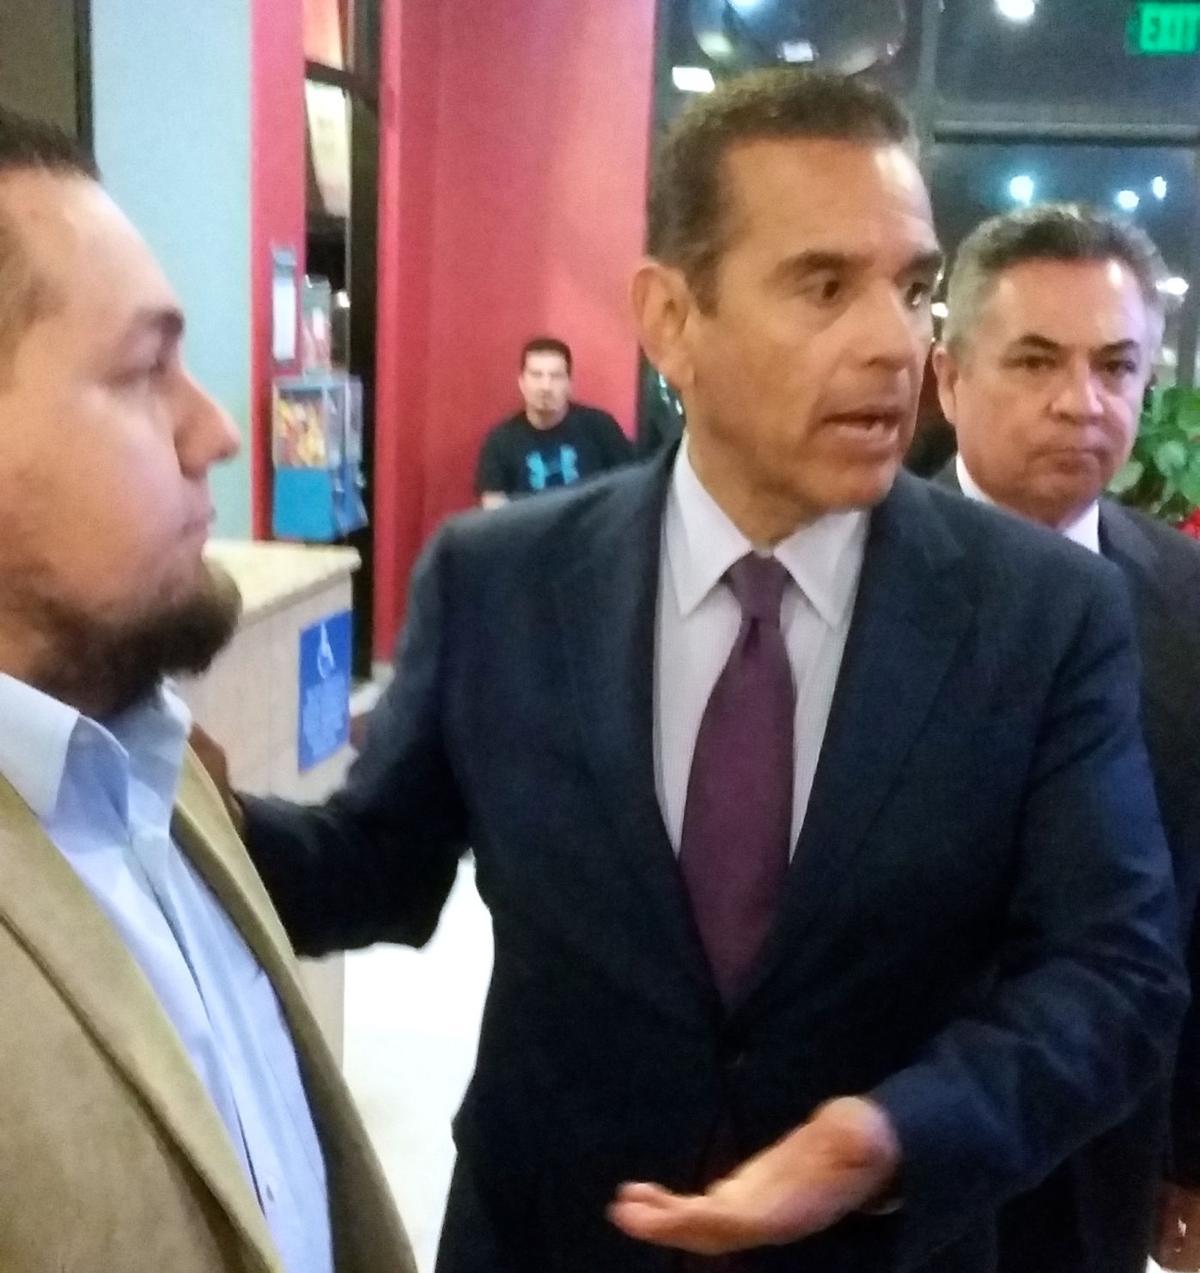 Gubernatorial Candidate And Former La Mayor Villaraigosa Holds Meets